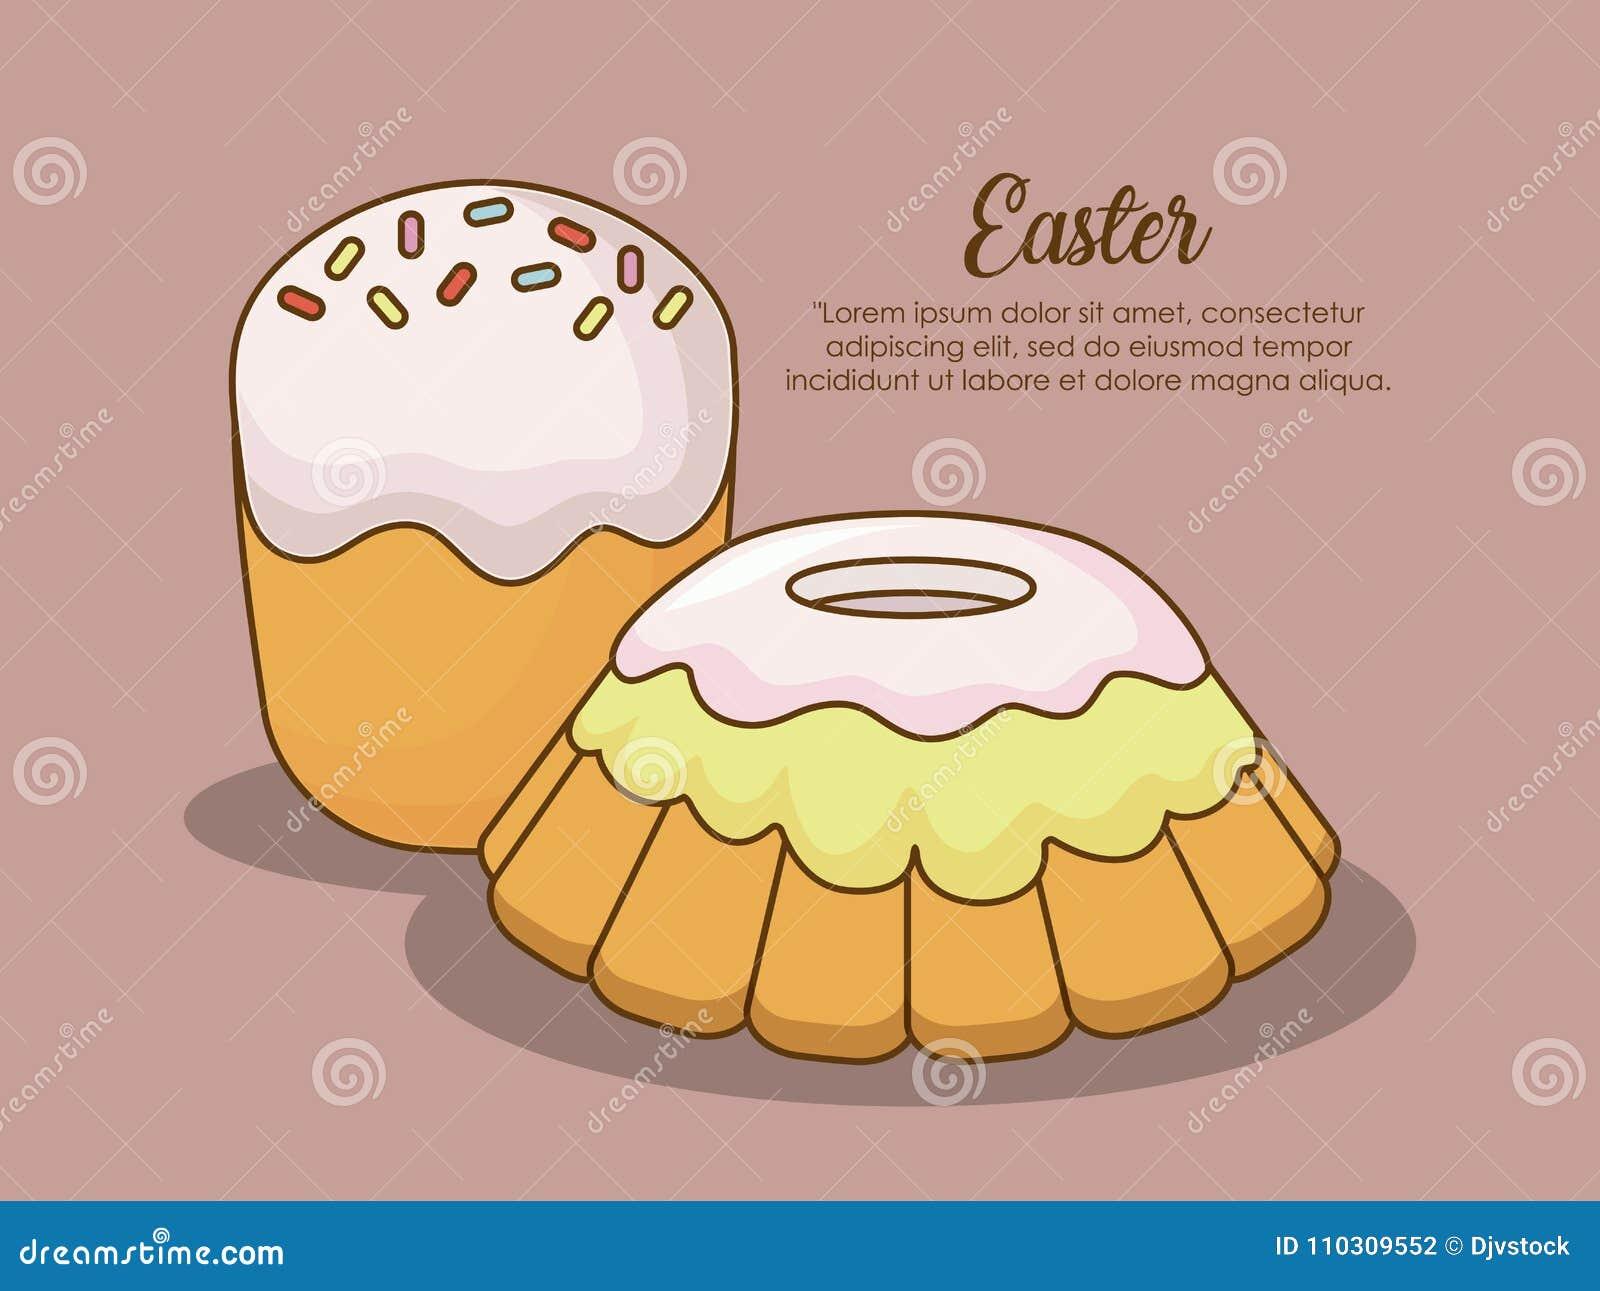 Happy easter day design stock vector. Illustration of jesus - 110309552